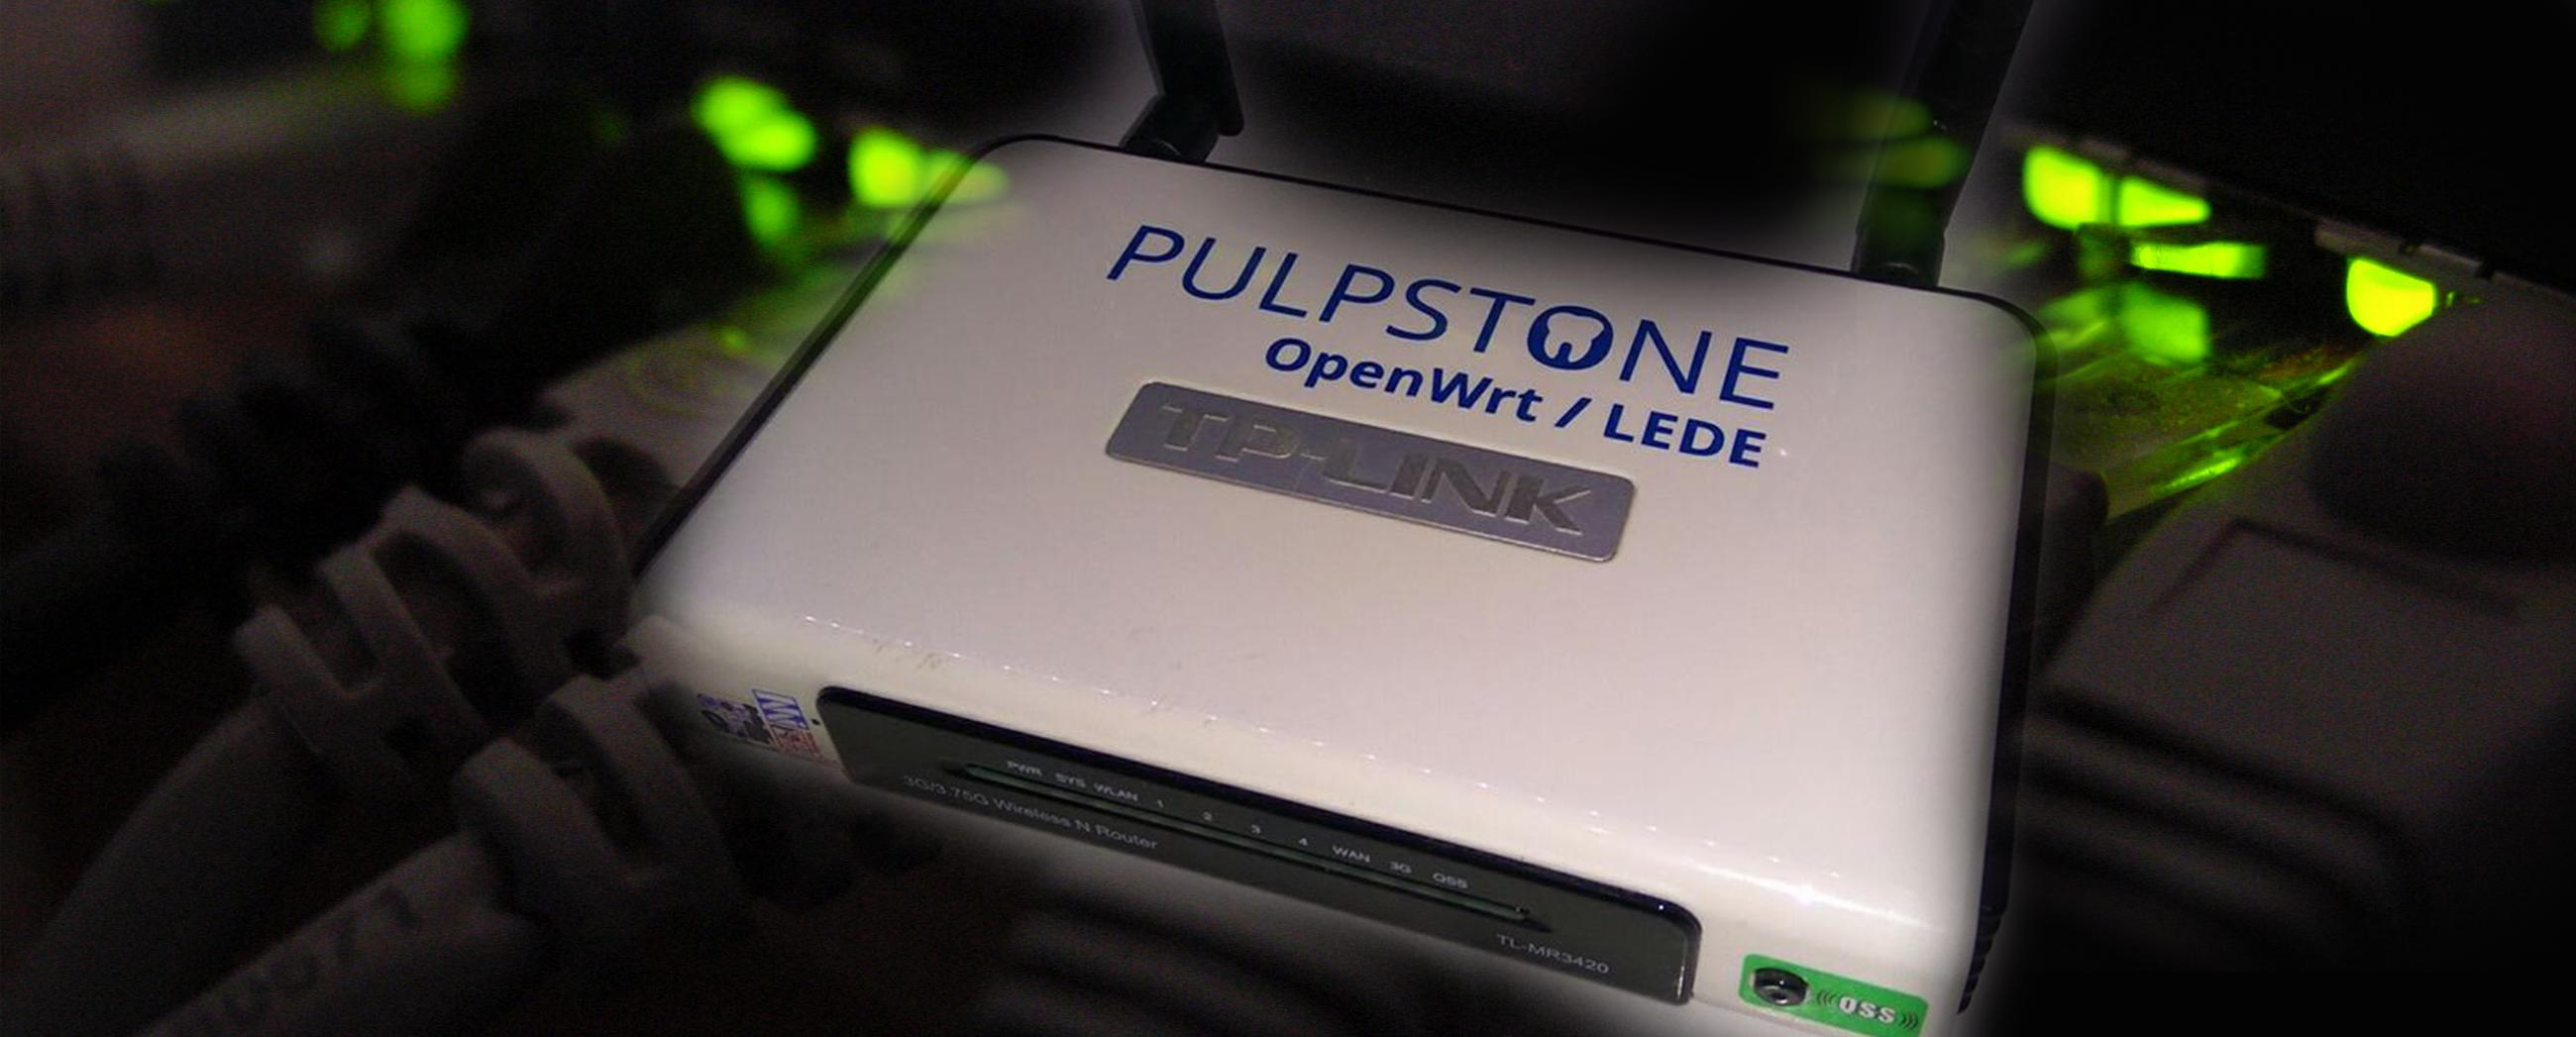 Pulpstone OpenWrt - LEDE